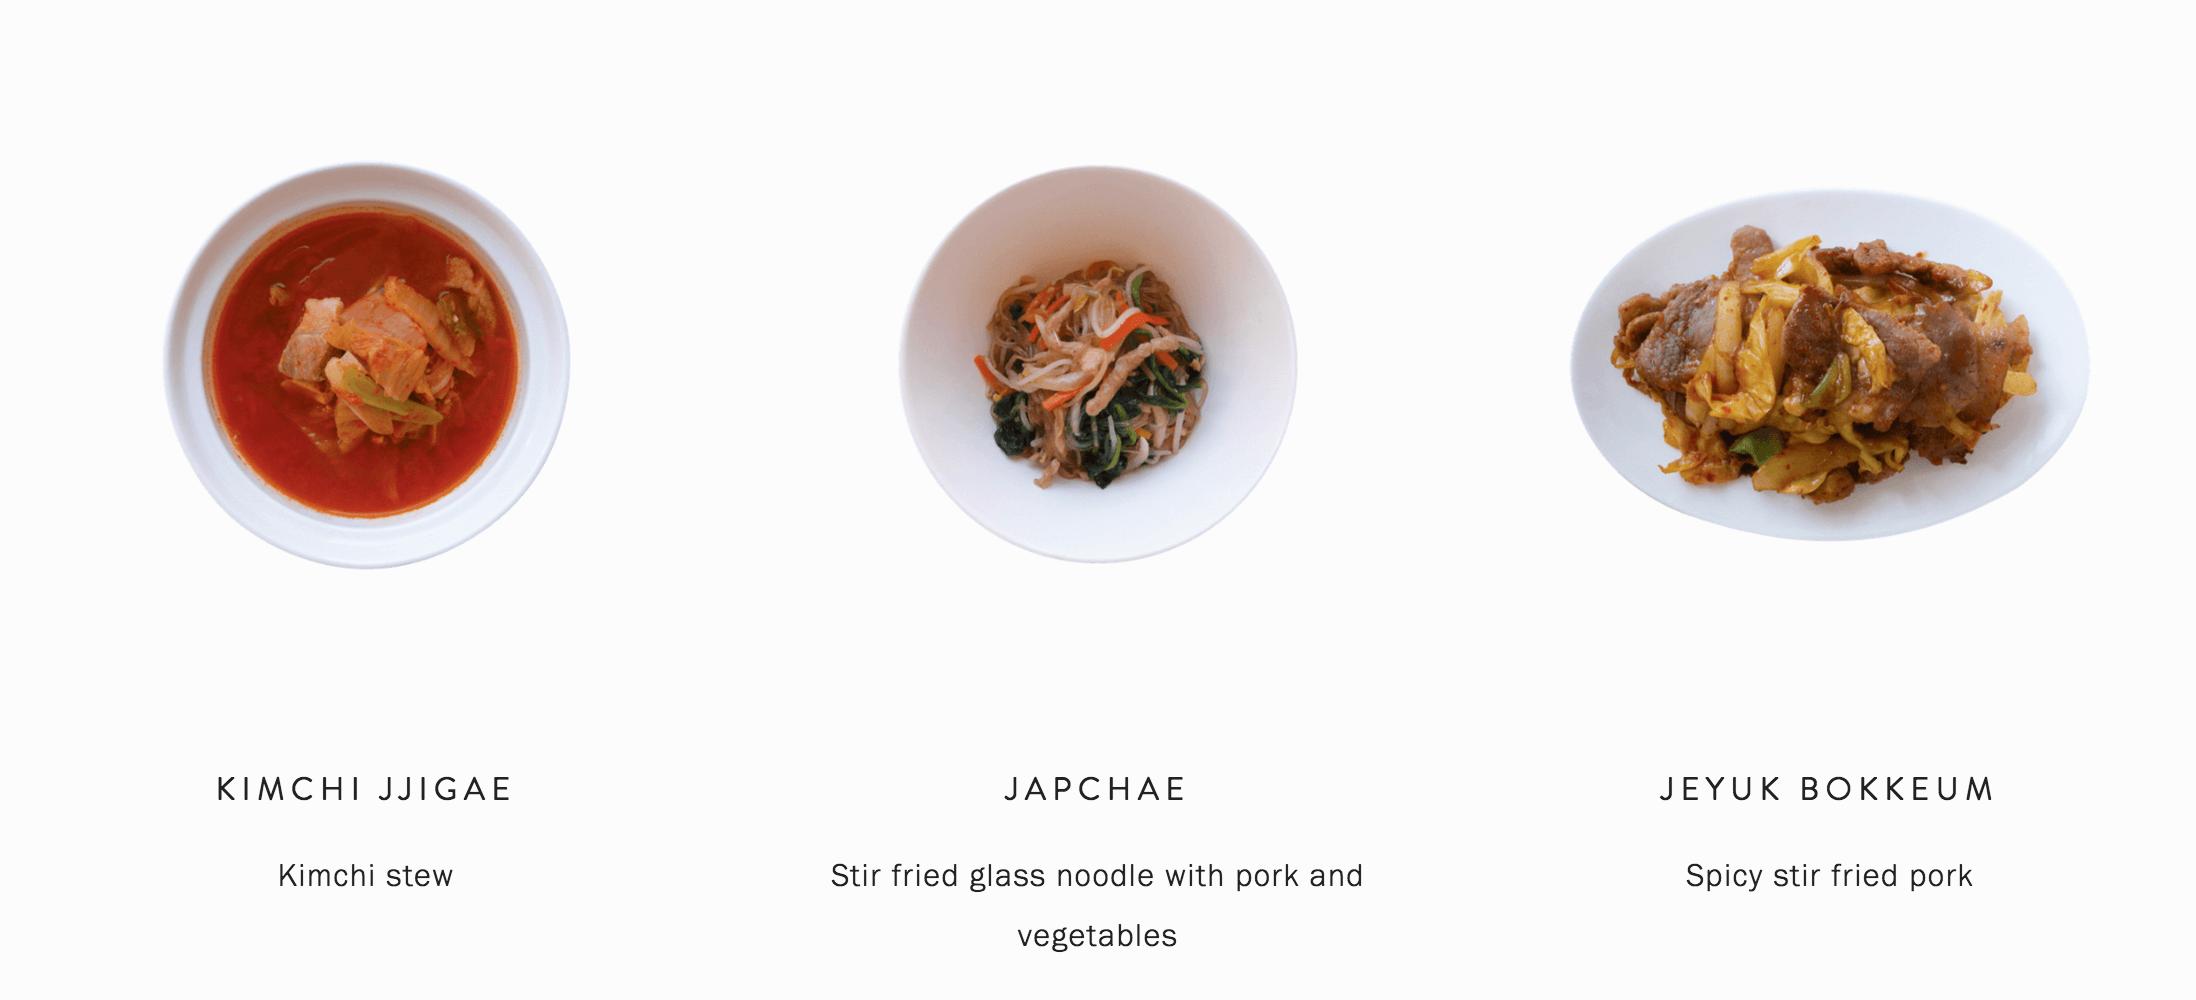 Cooking class in Seoul - Kimchi Jjigae (Kimchi stew), Japchae (Glass noodle), Jeyuk Bokkeum(Spicy stir fried port)